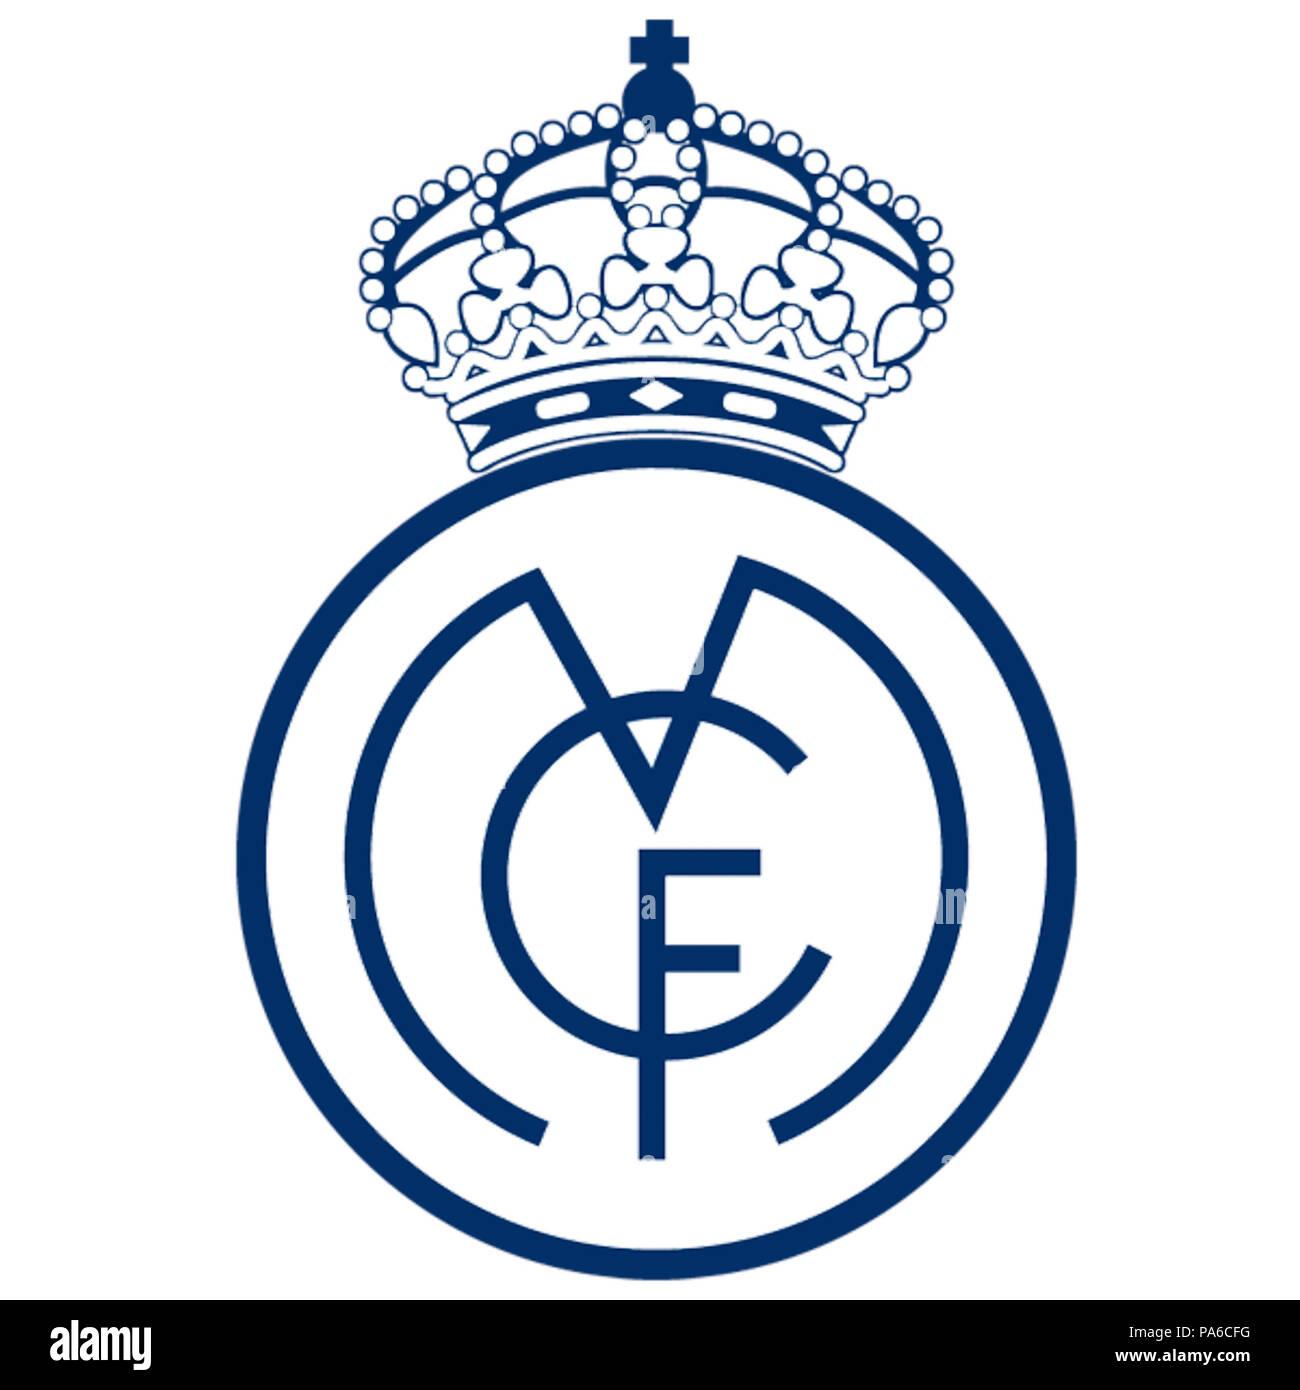 626 Escudo Real Madrid 1920 Stock Photo  212812532 - Alamy. 626 Escudo Real  Madrid. Pegatinas ESCUDO REAL MADRID REF  PD115 - Ecoshirt pegatinas y . 91f1cfb21c3a6